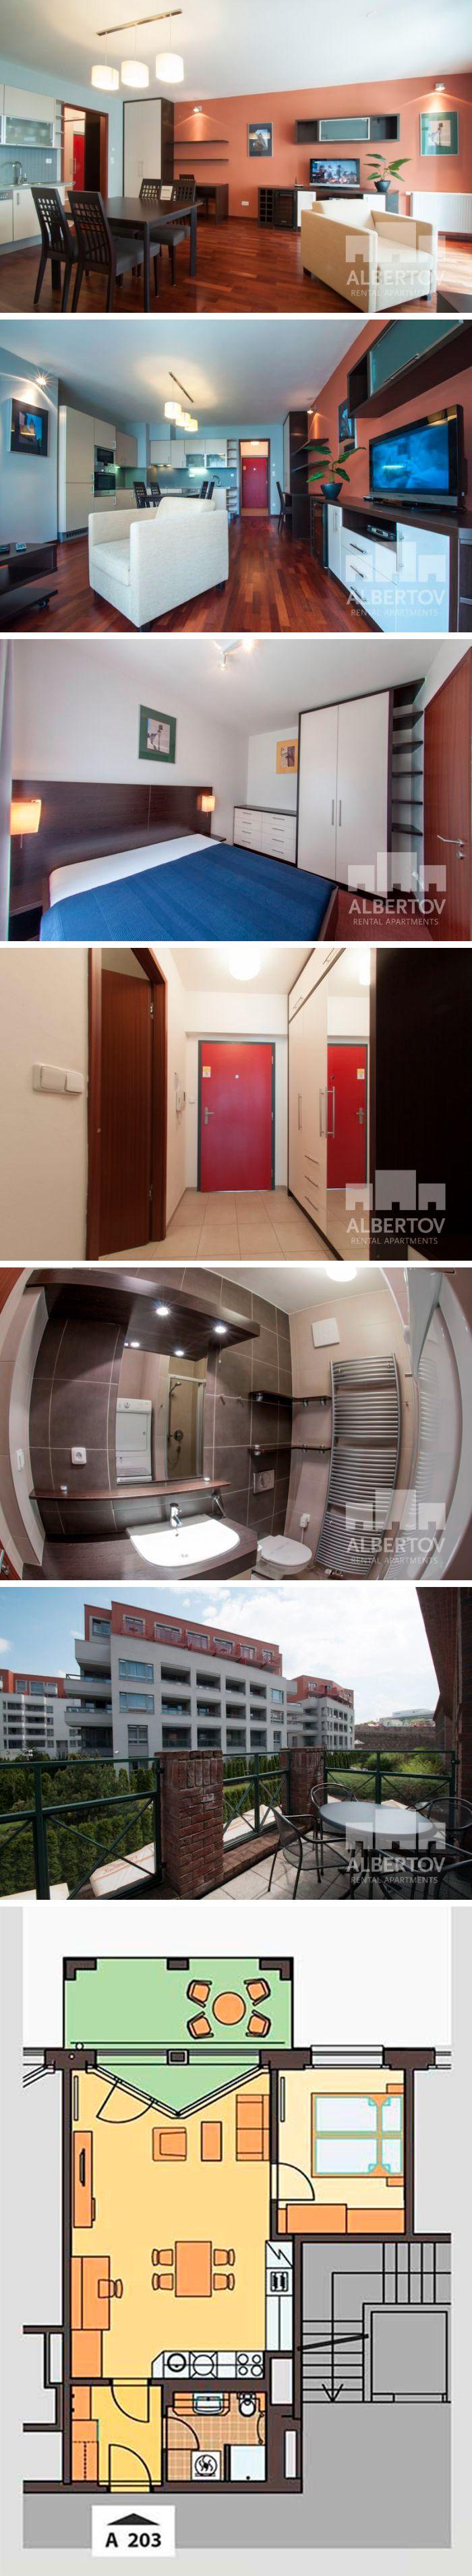 A.203 apartment for rent in Prague: dispozition: 2+kk, floor: 2, balcony, total: 59,2 m2. Albertov Rental Apartments, Horská 2107/2d, Praha 2. Reception: +420 602 22 66 33, reception@albertov.eu, www.albertov.eu